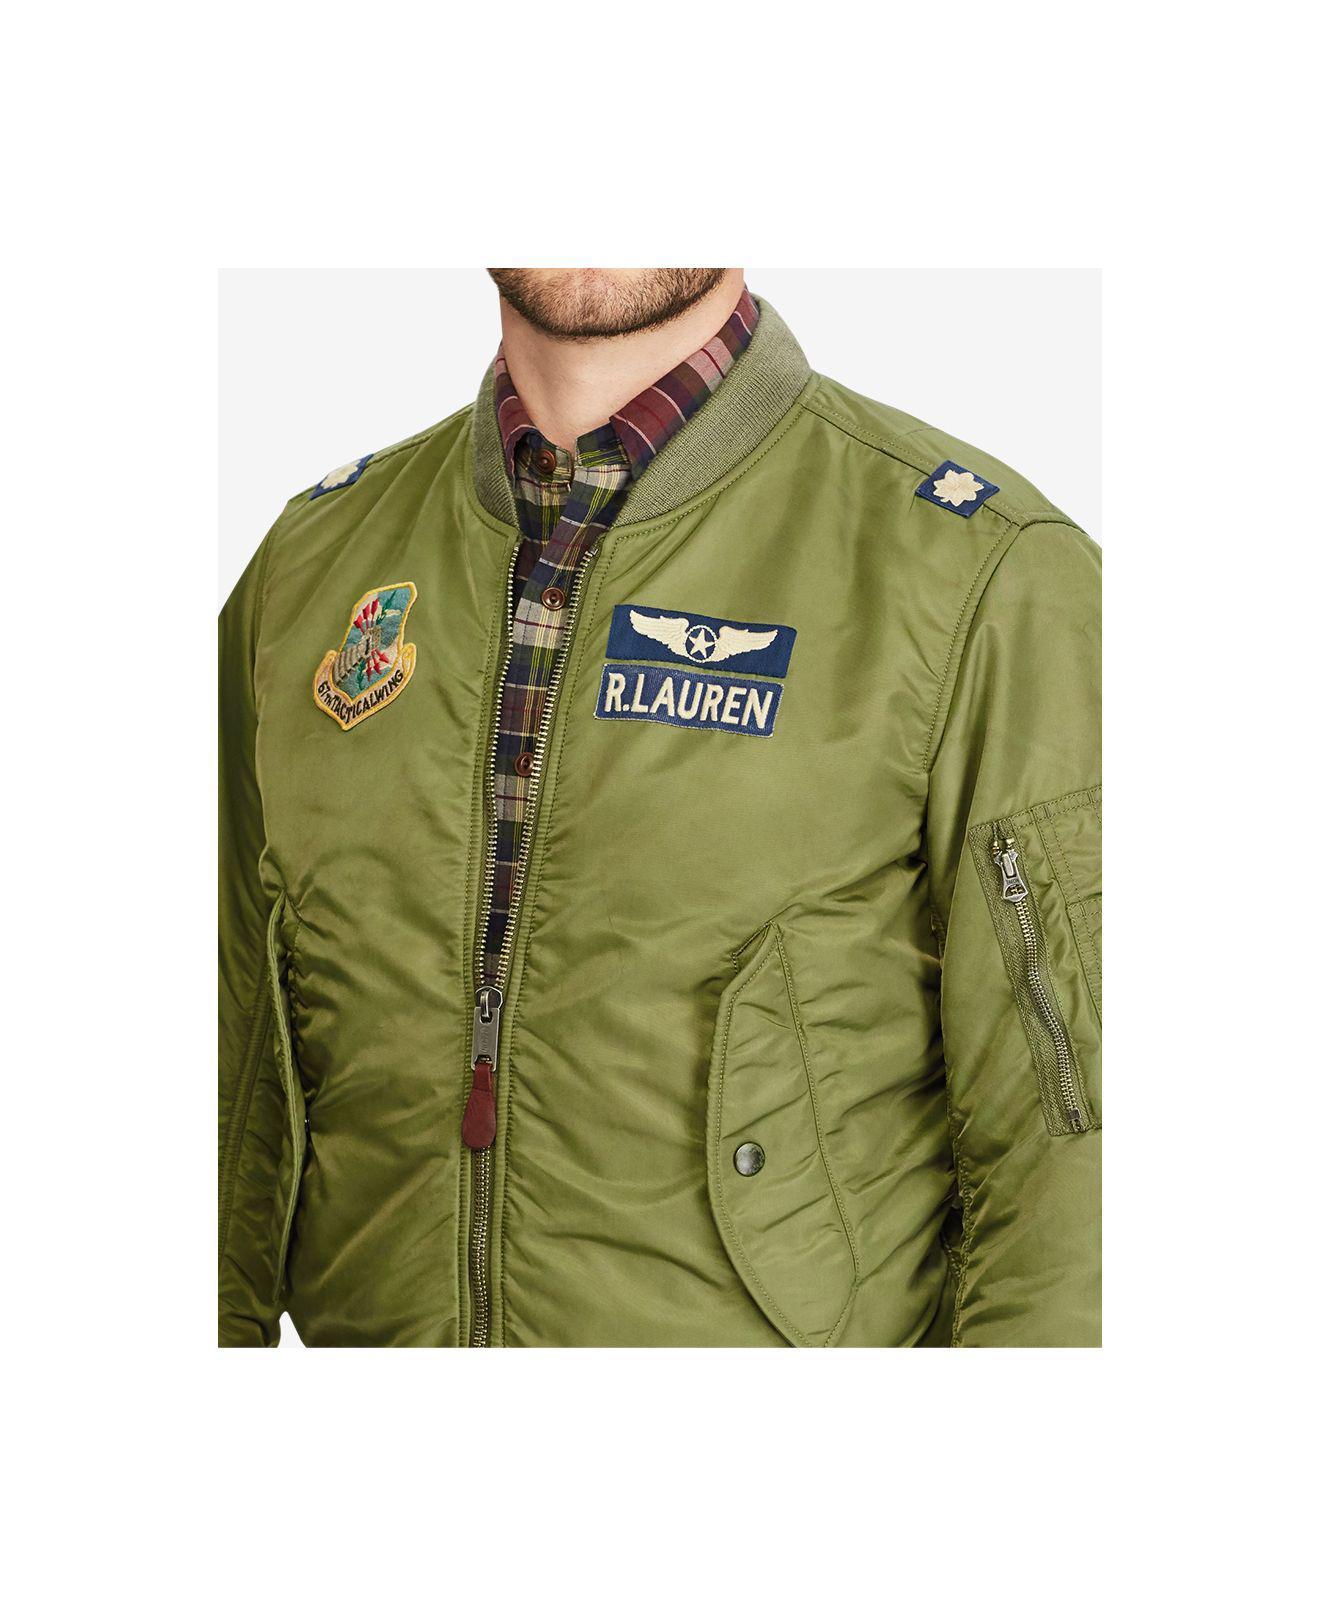 polo ralph lauren men 39 s iconic ma 1 bomber jacket in green for men lyst. Black Bedroom Furniture Sets. Home Design Ideas